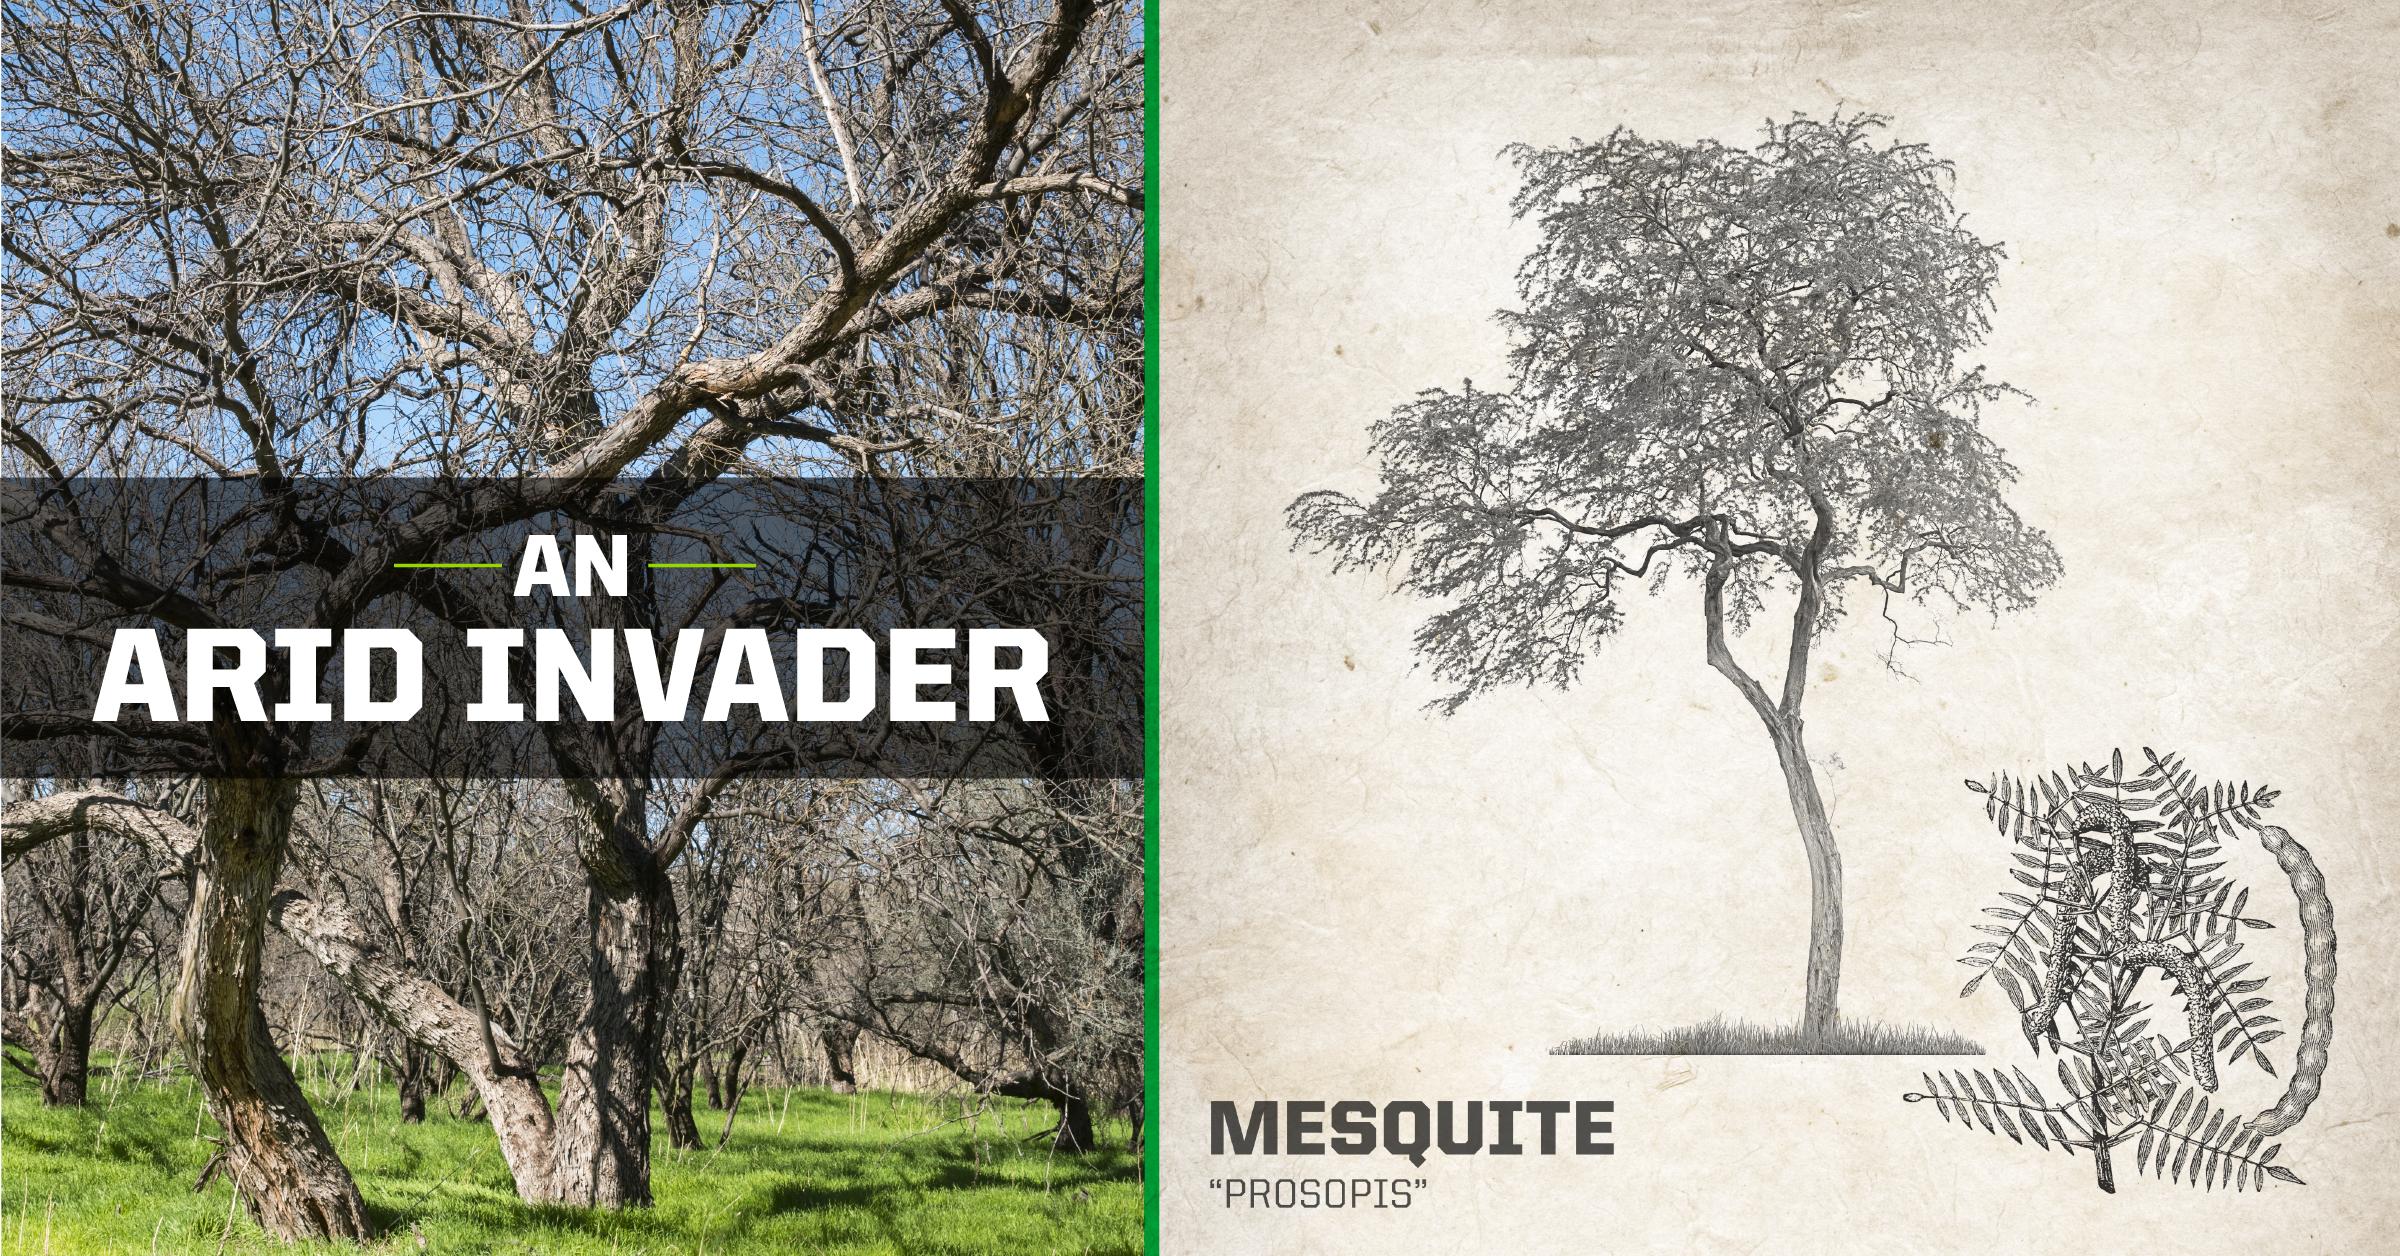 Mesquite Tree - An Arid Invader